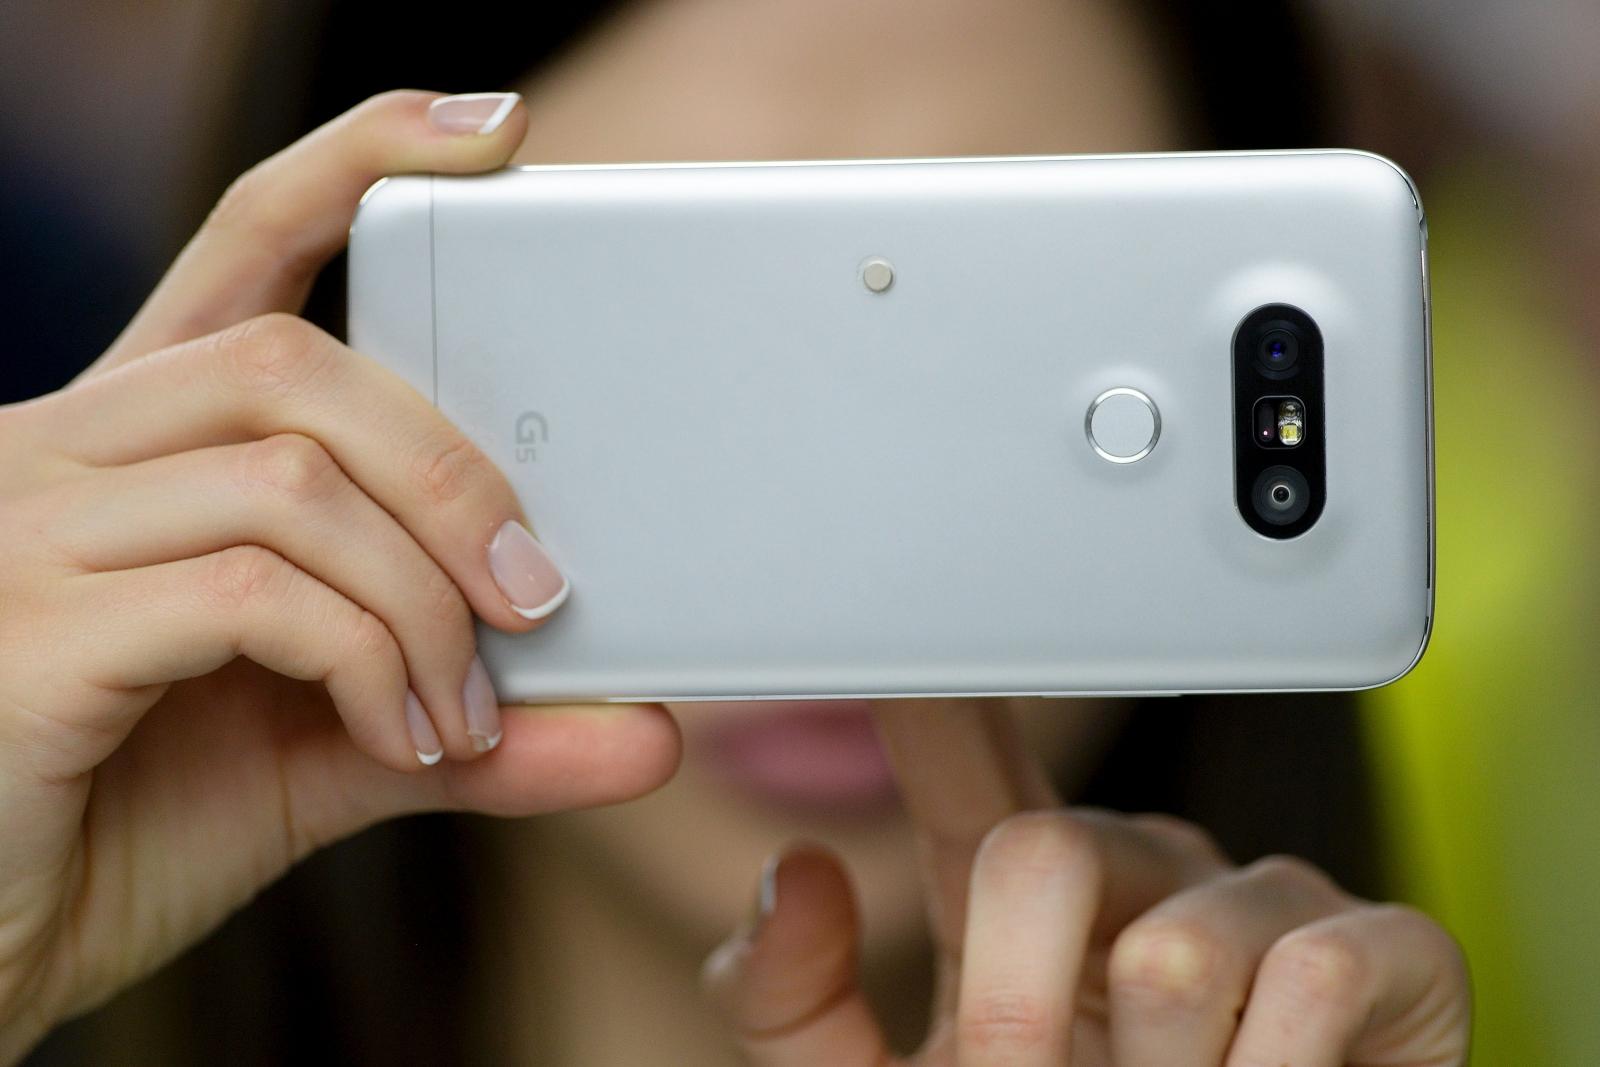 LG G6 camera app ported to G5